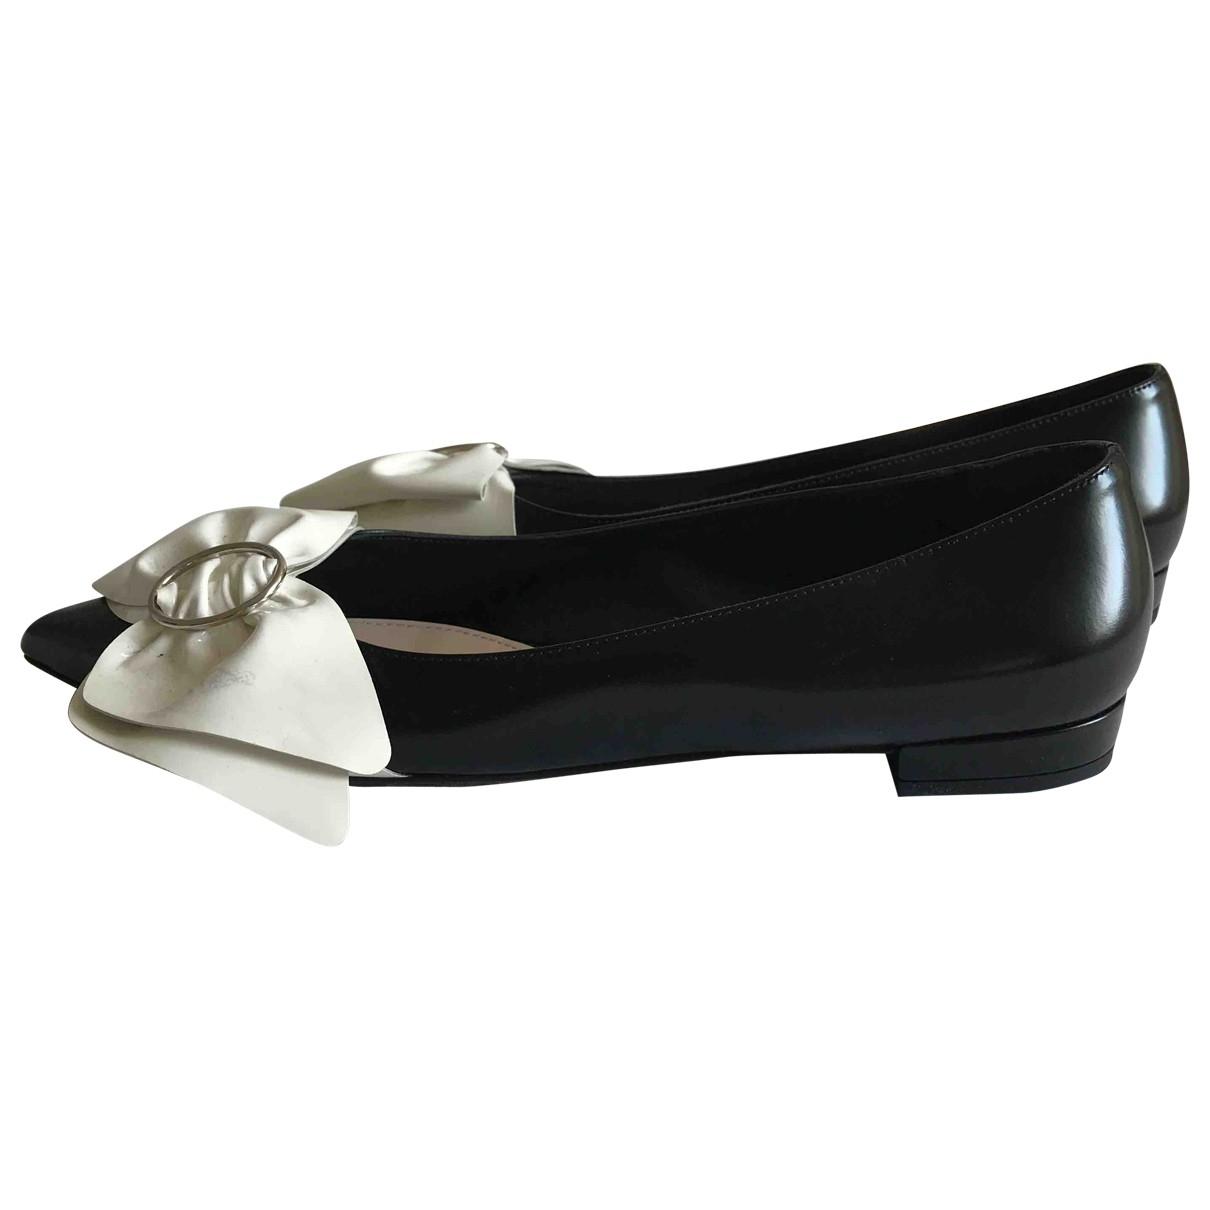 Prada \N Black Leather Ballet flats for Women 37.5 EU